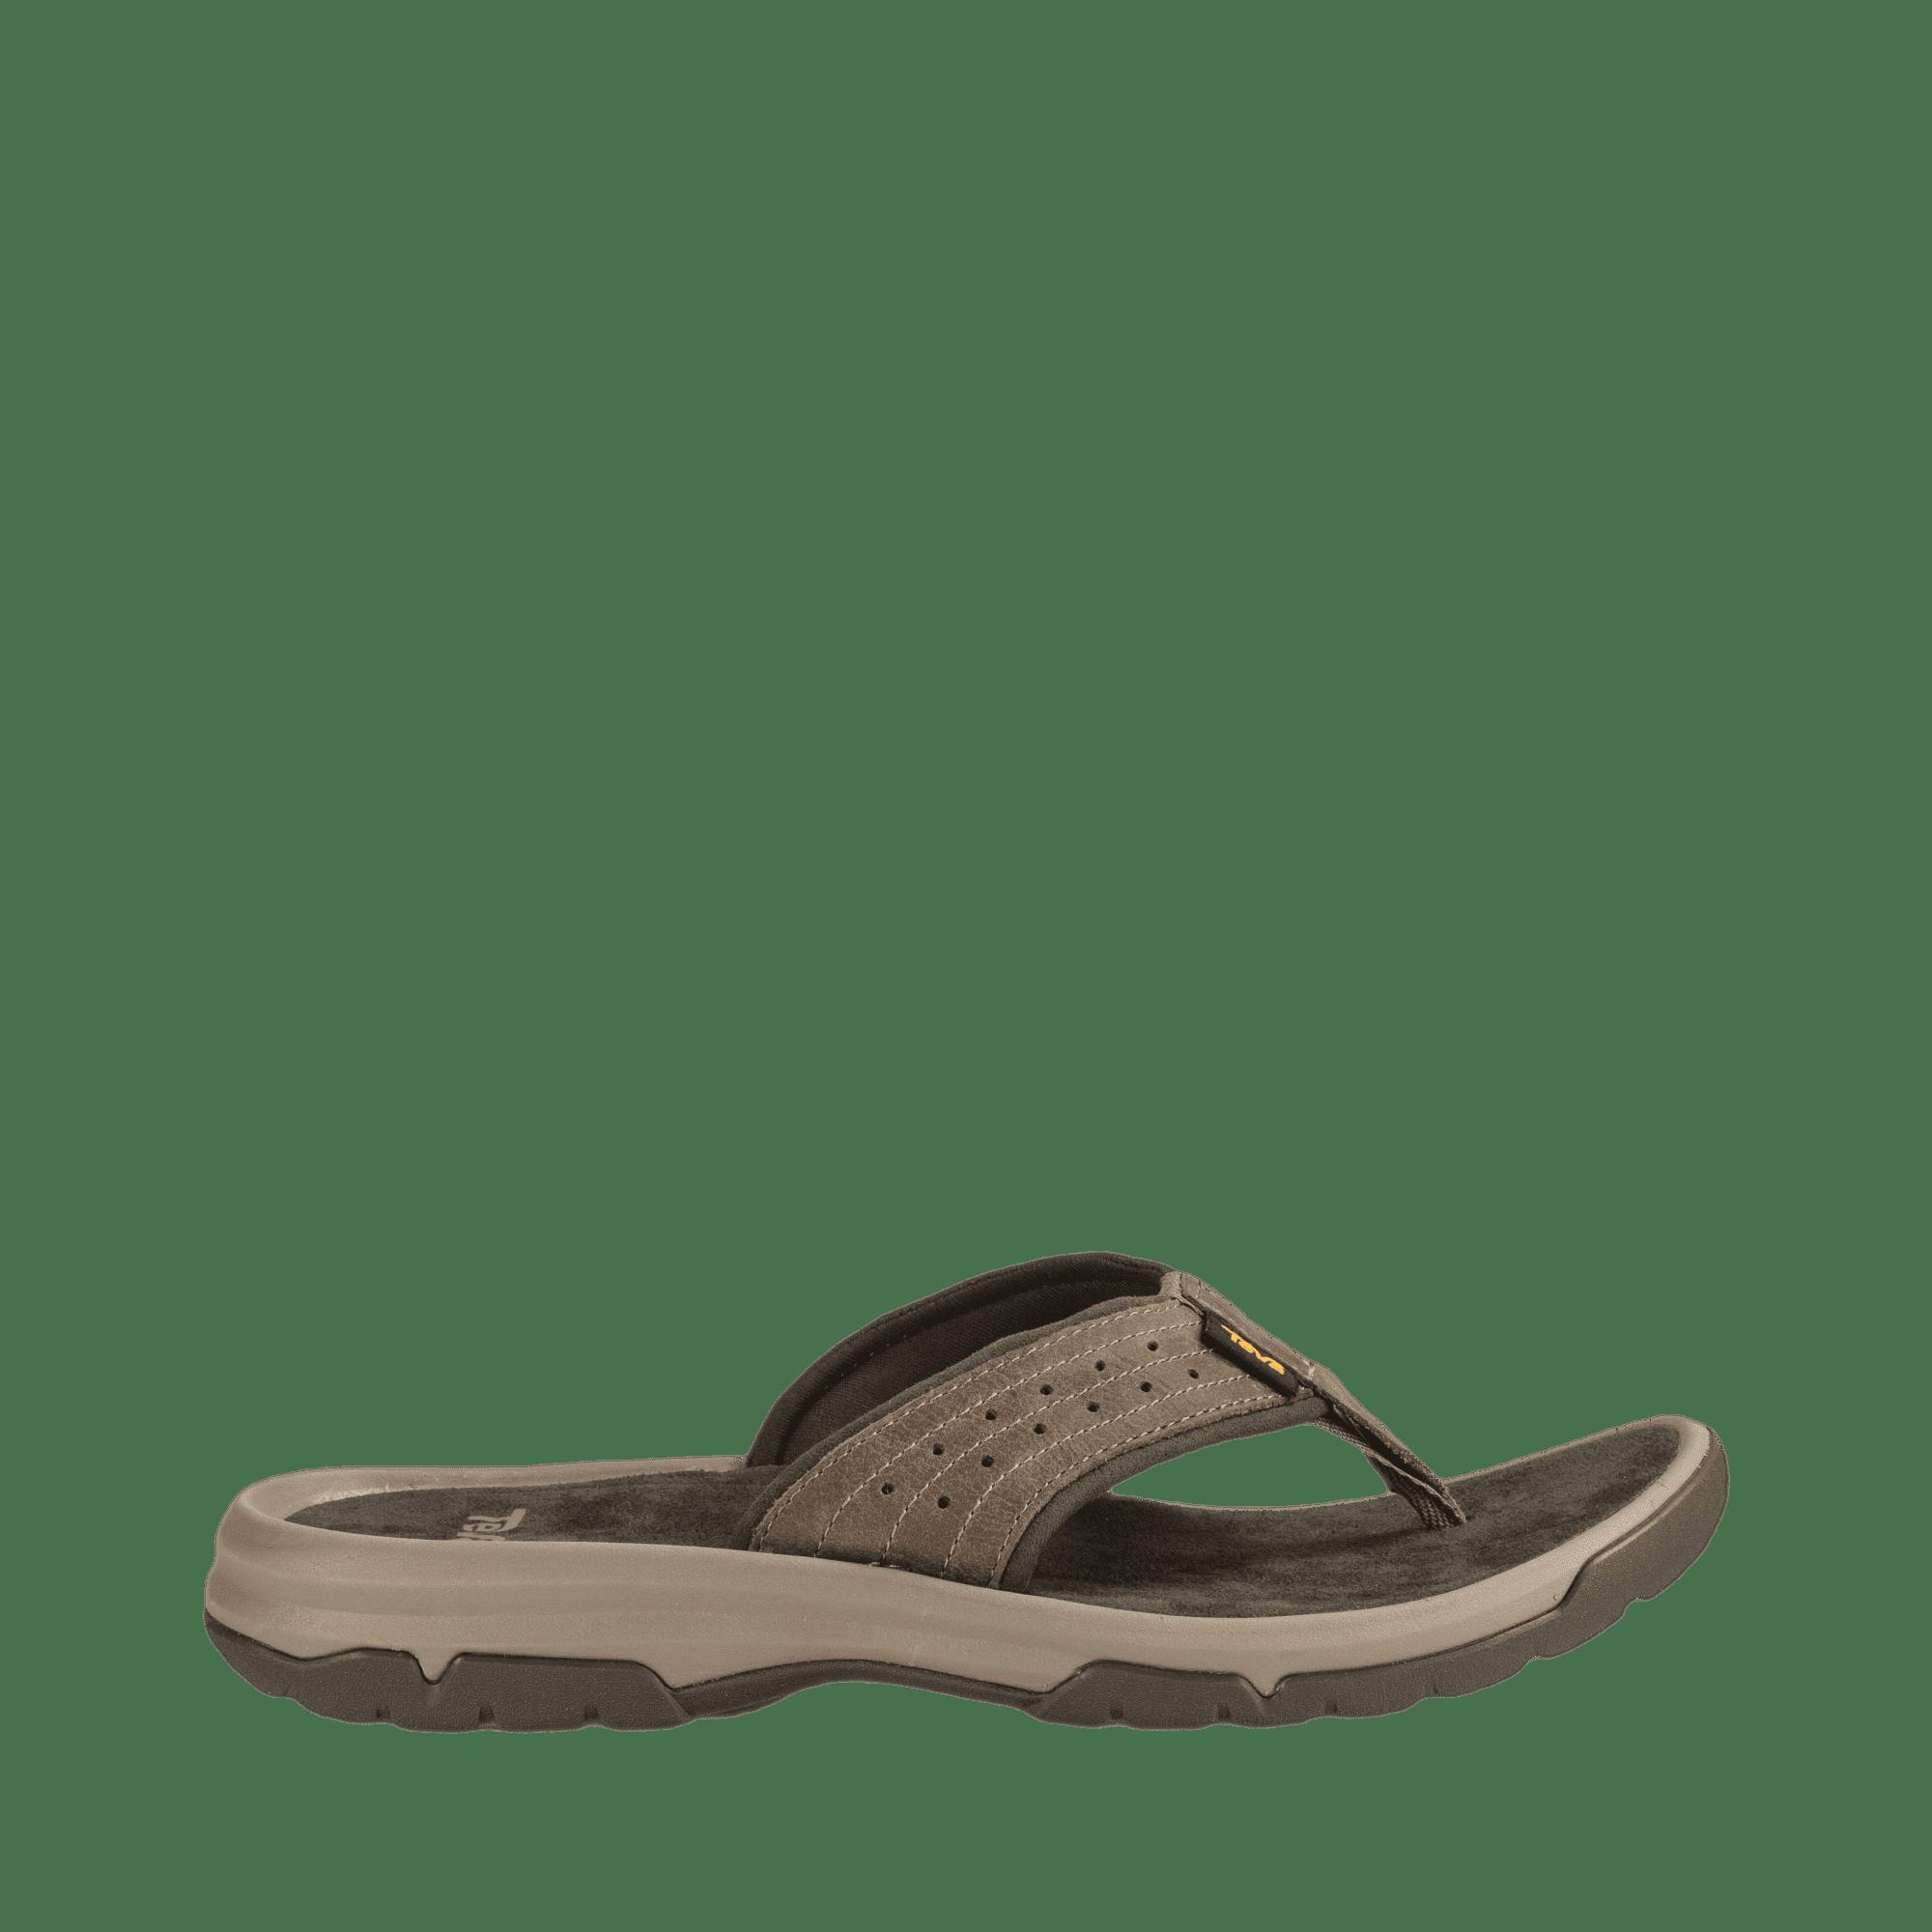 Langdon flip teenslippers